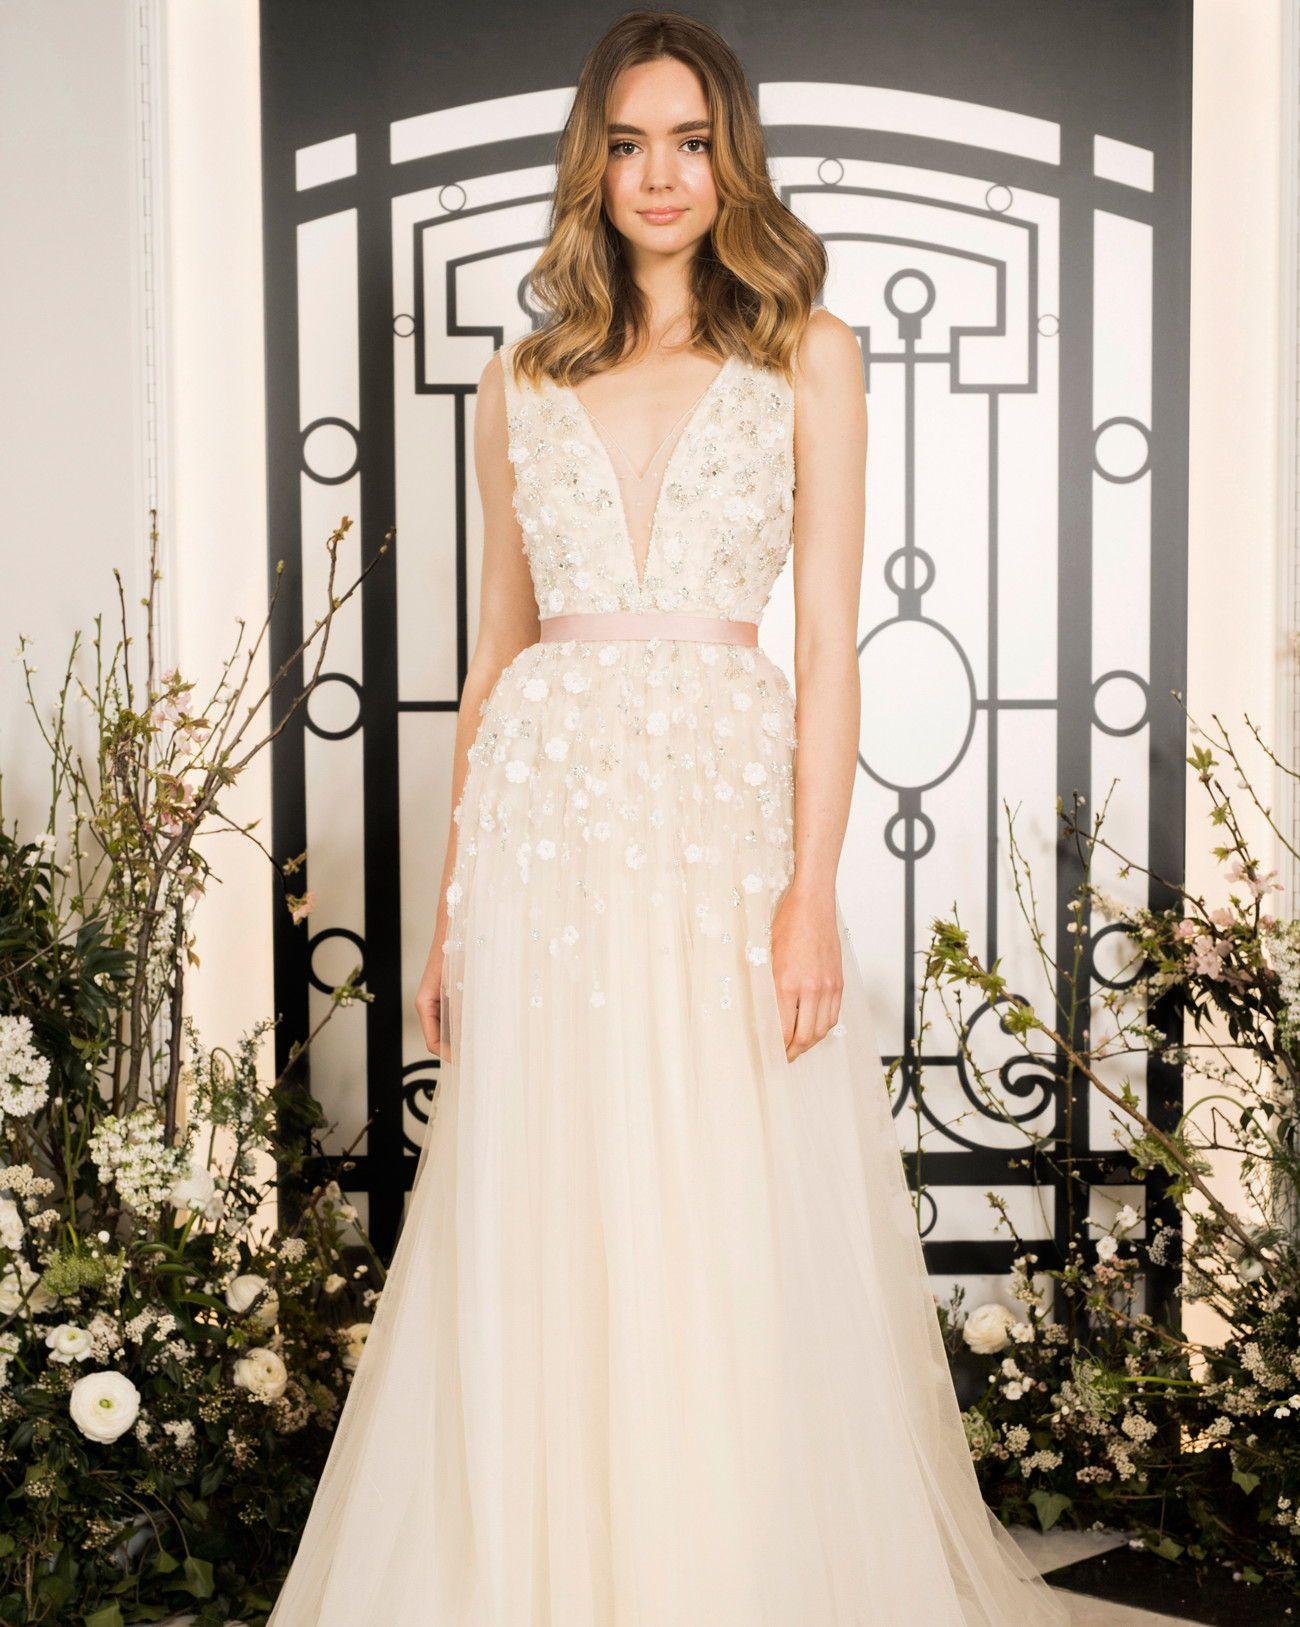 03e3cbdb747 Jenny Packham Spring 2020 Wedding Dress Collection